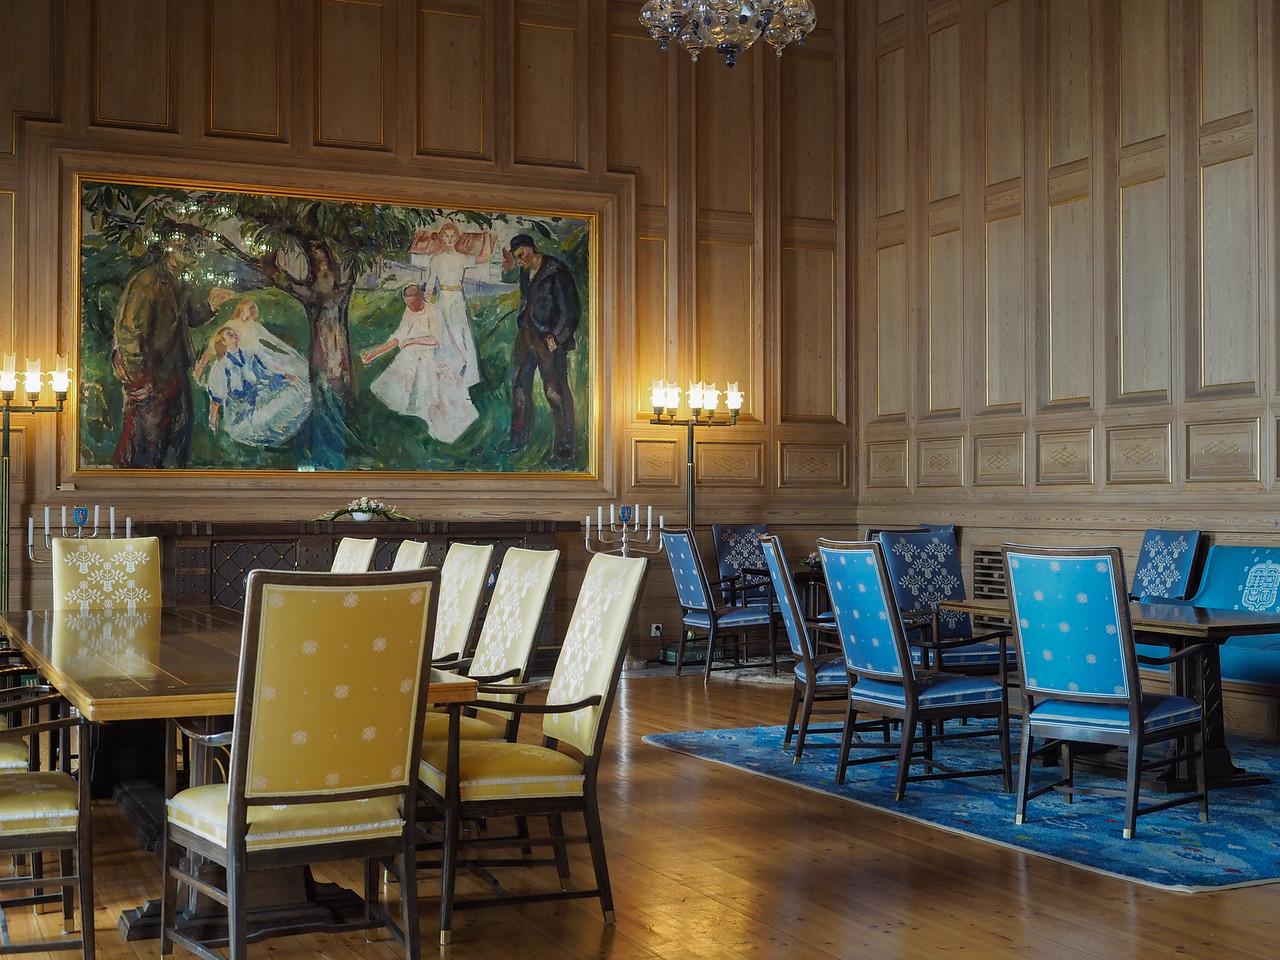 Edvard Much Room, Oslo City Hall